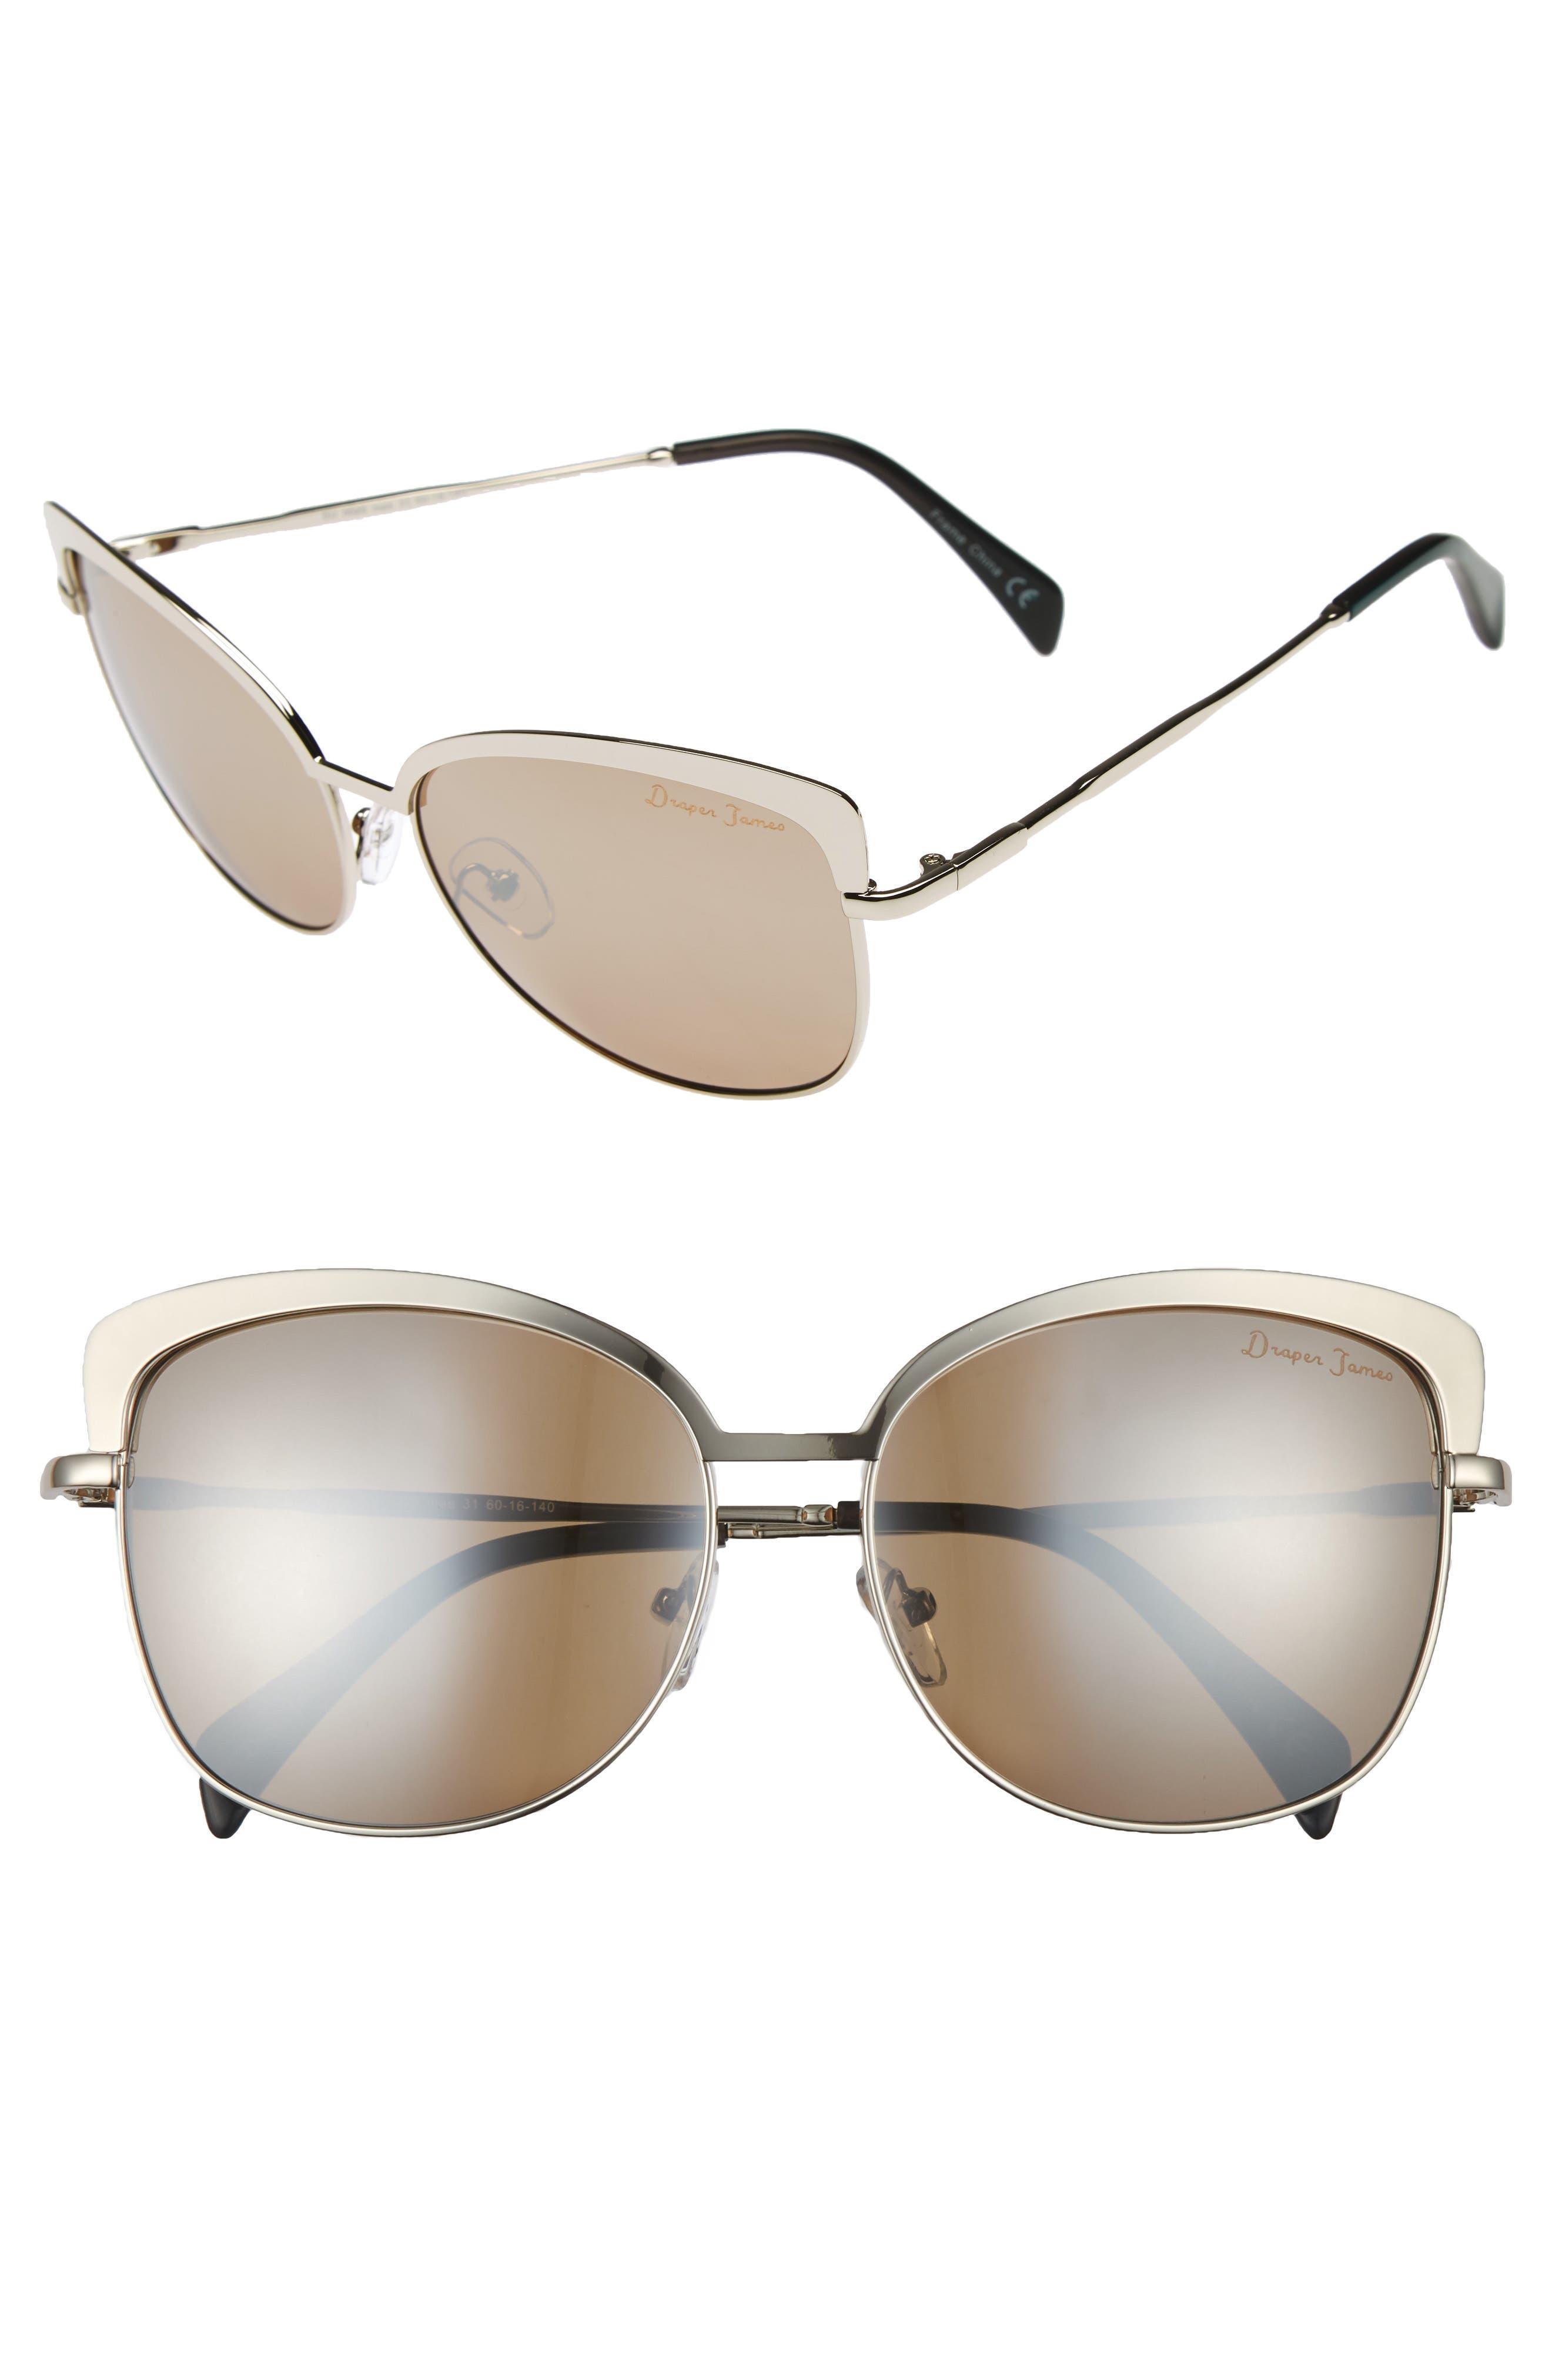 60mm Cat Eye Sunglasses,                         Main,                         color, Shiny Gunmetal